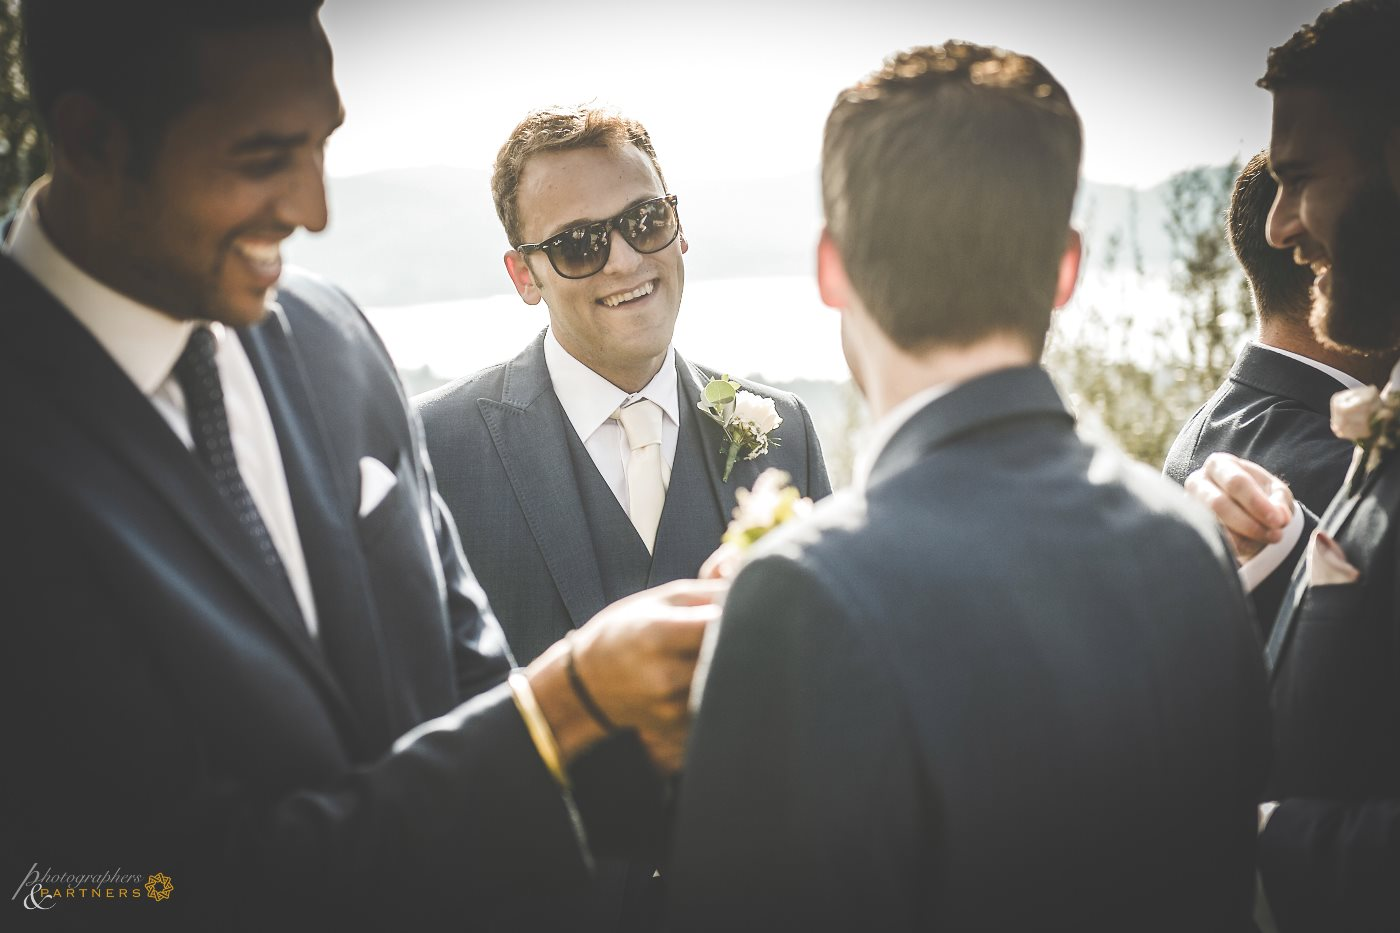 wedding_photography_cortona_02.jpg